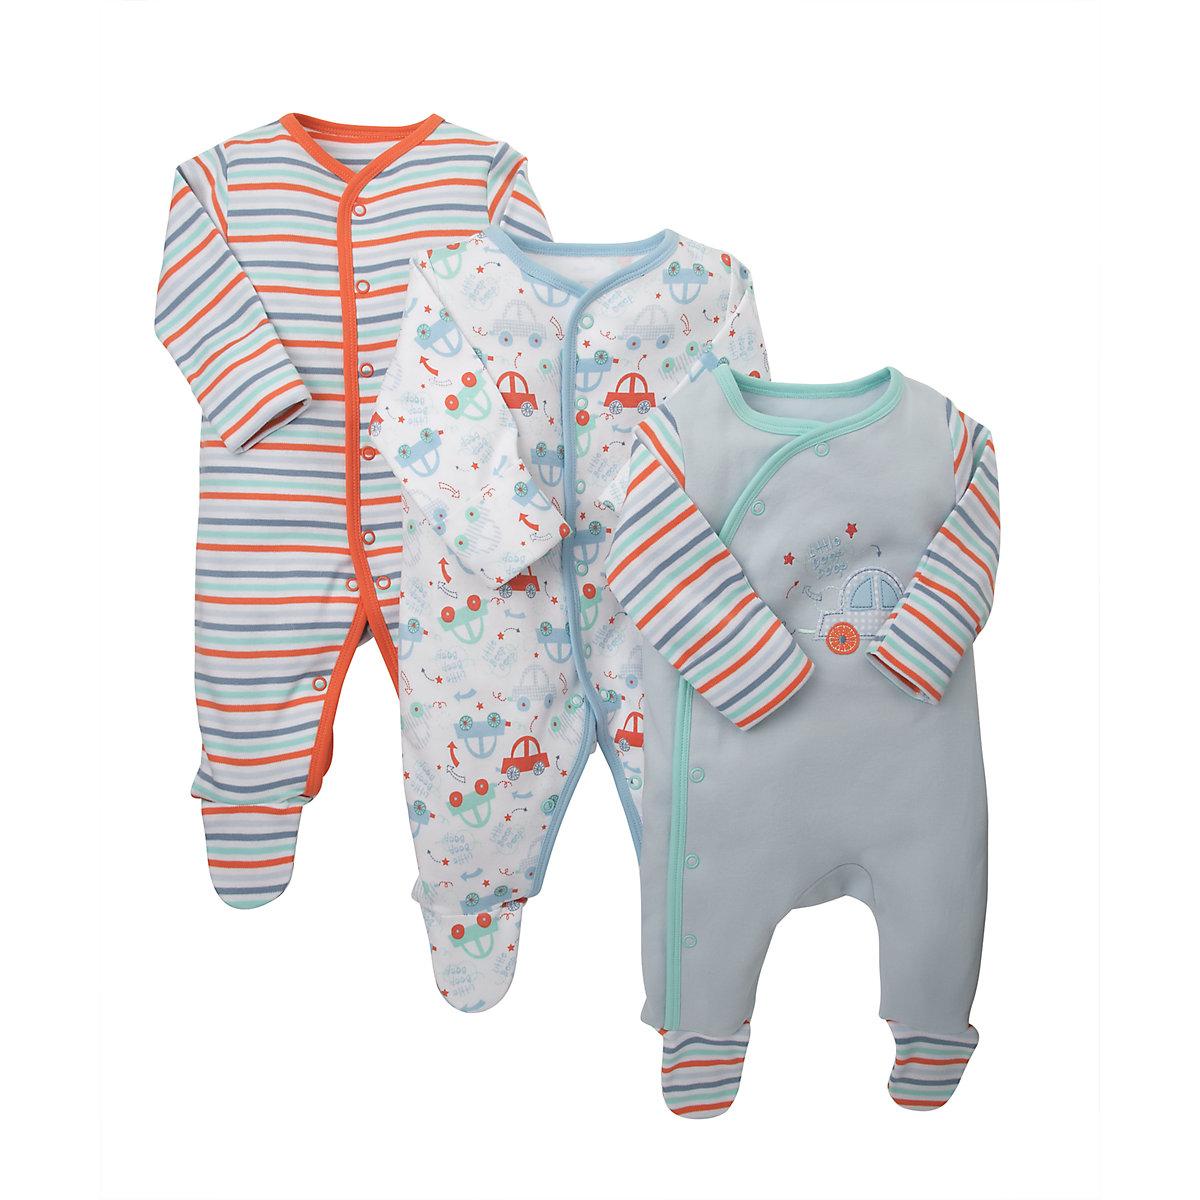 B Newborns Little Beep Beep Sleepsuits - 3 Pack Size tiny